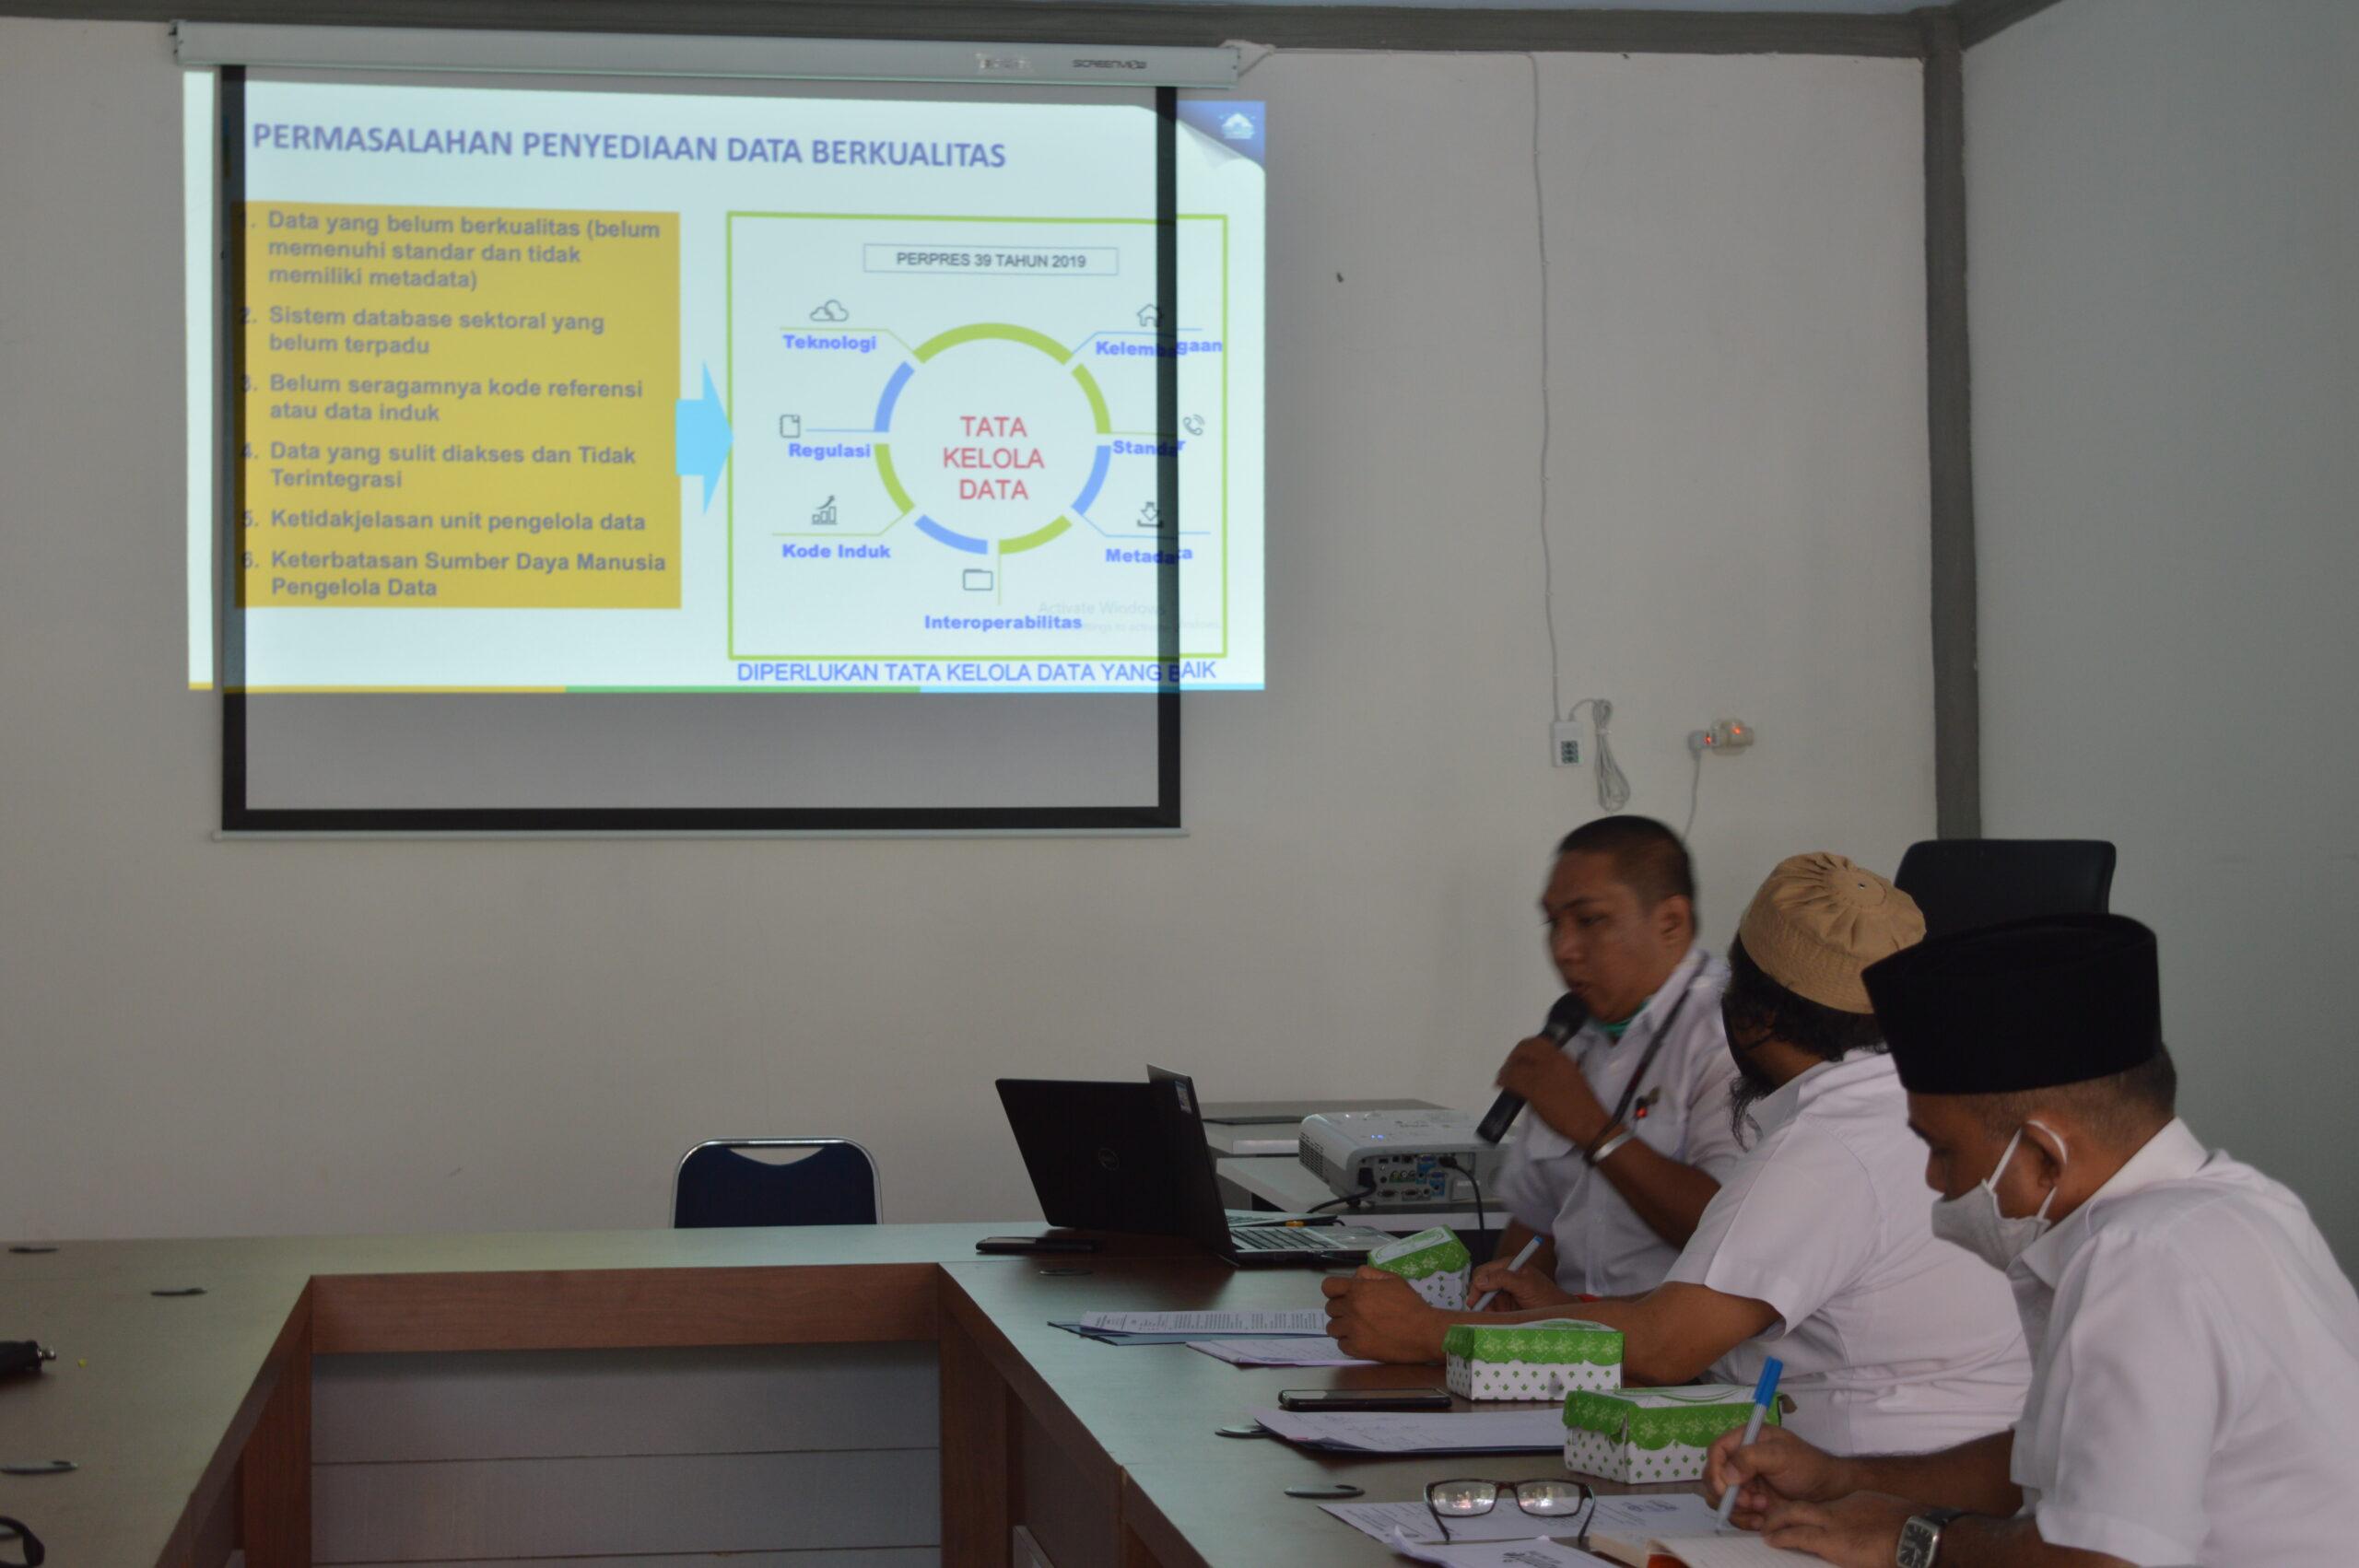 Luwu Timur Bakal Berlakukan Satu Data Indonesia